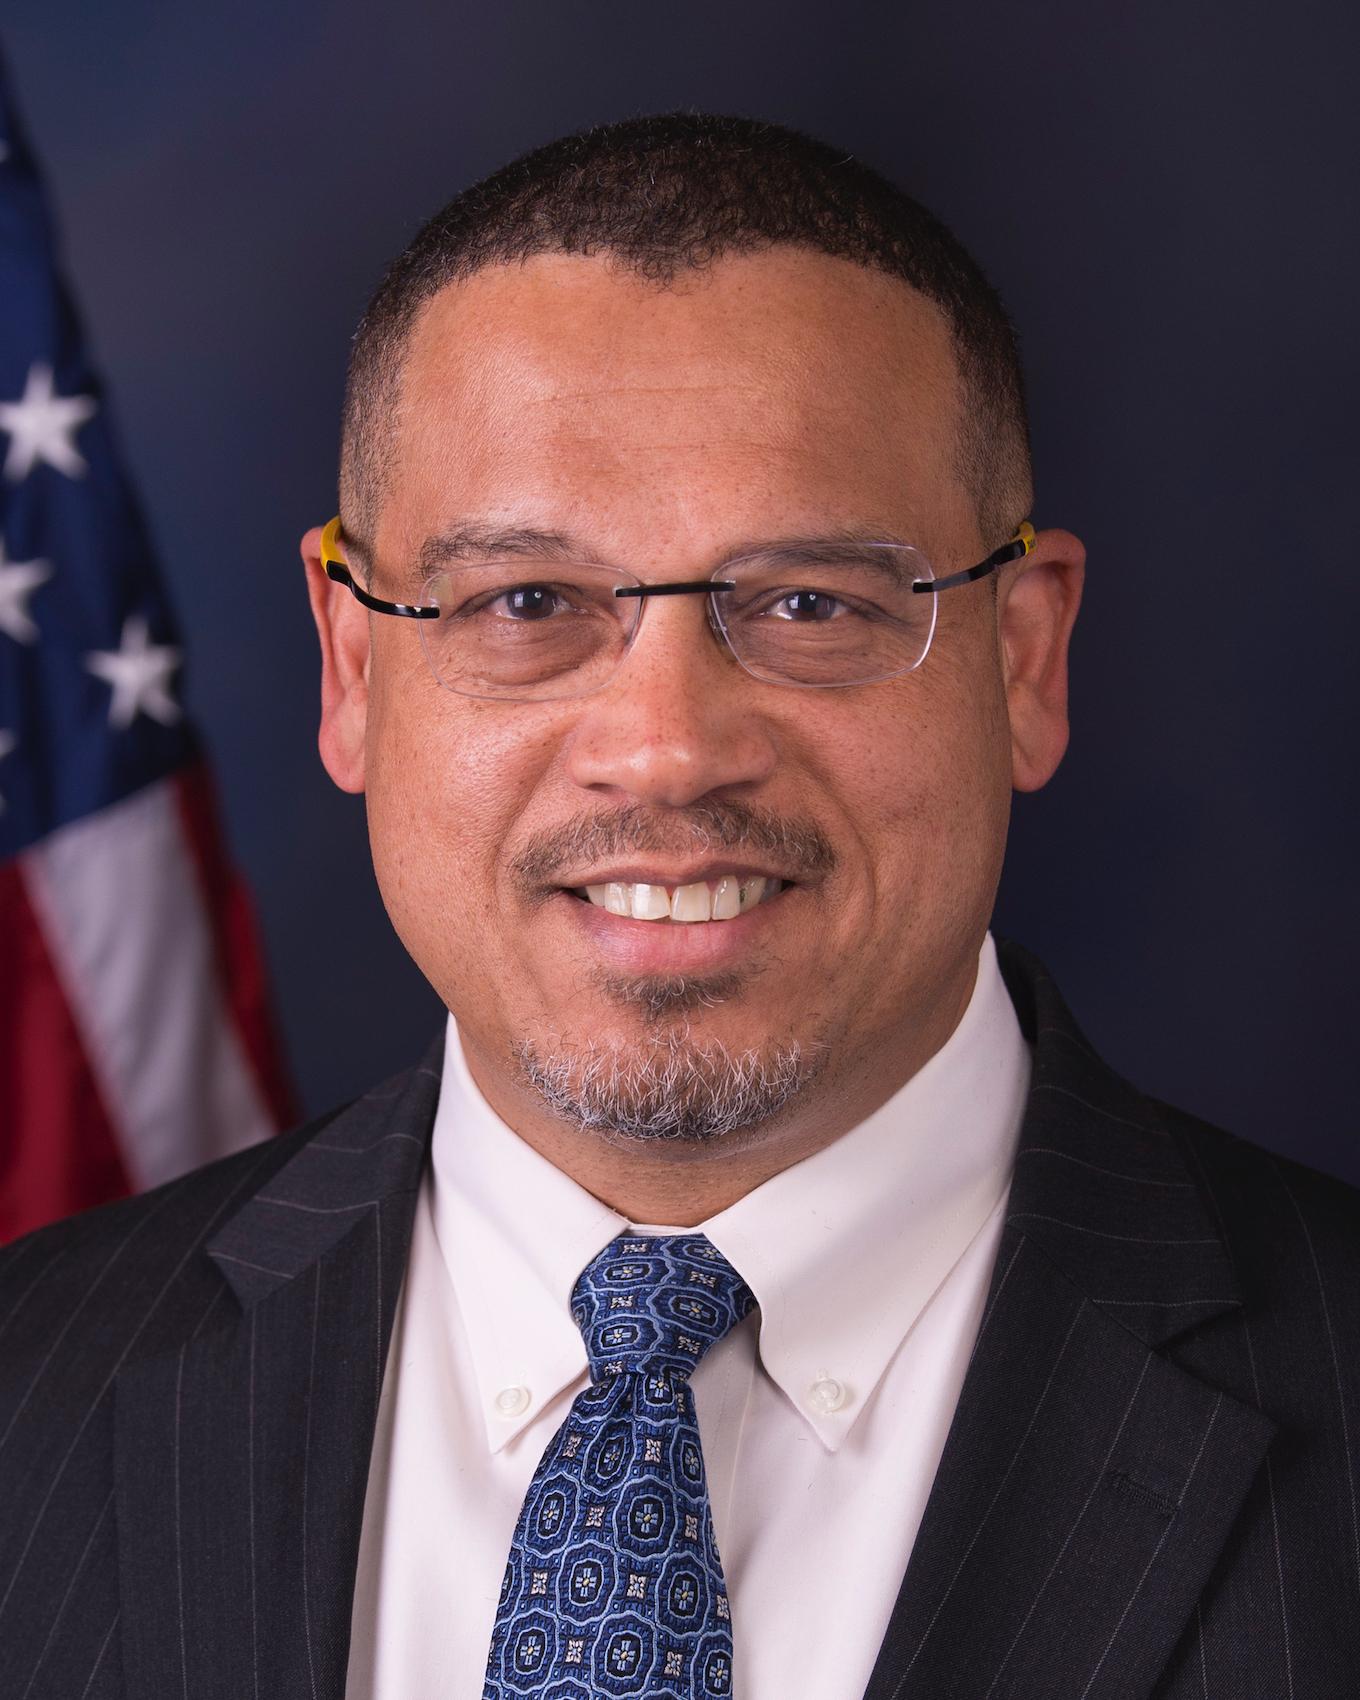 2017 Democratic National Committee chairmanship election